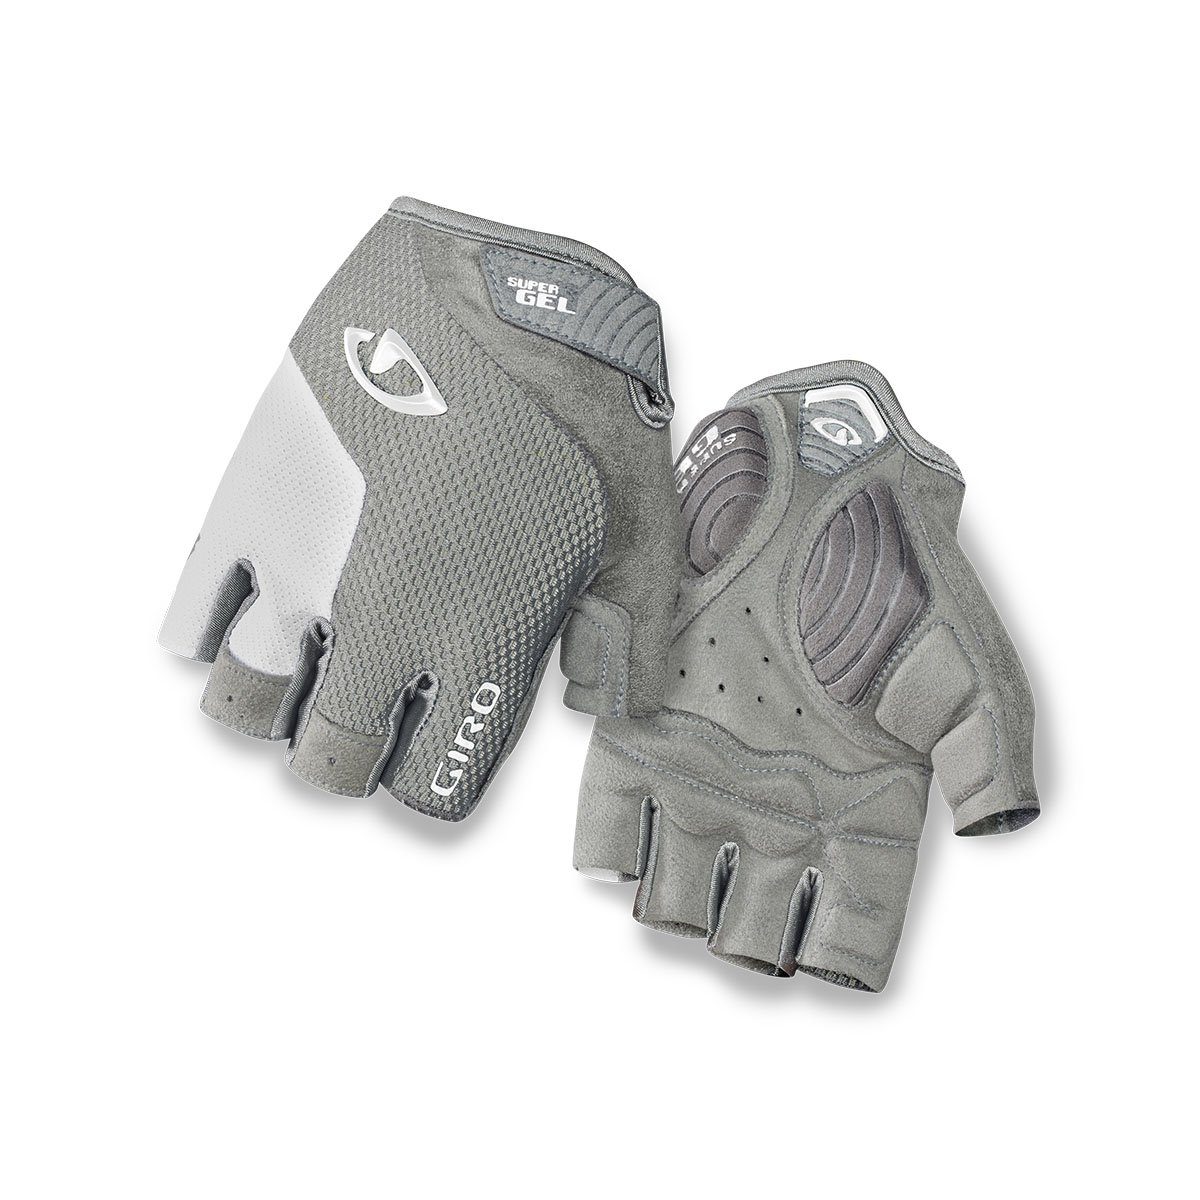 Giro Strada Massa 15 Größe M Damen Handschuhe Dunkelgrau